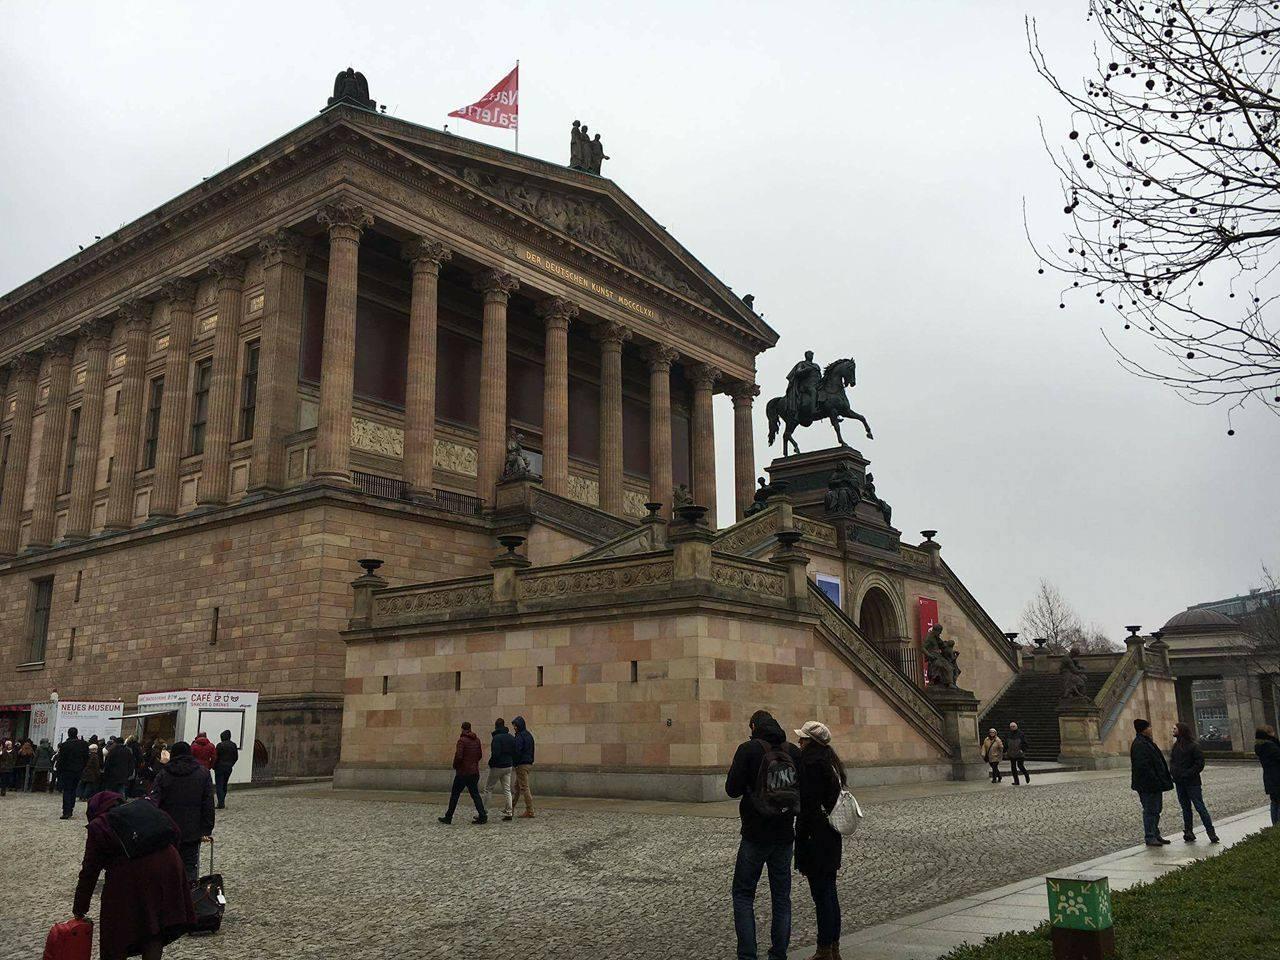 Museum Island a UNESCO World Heritage Site in Berlin